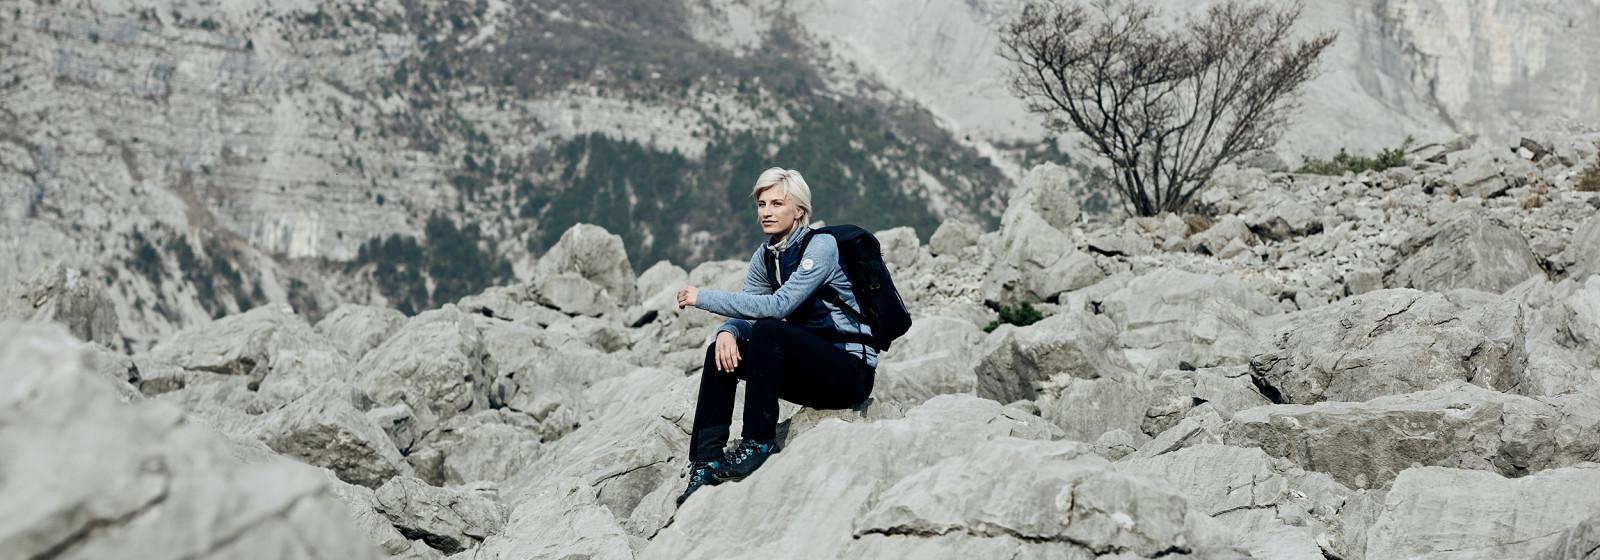 Imagefoto mit dem LAVENA II GTX Ws, Image Shooting Gardasee